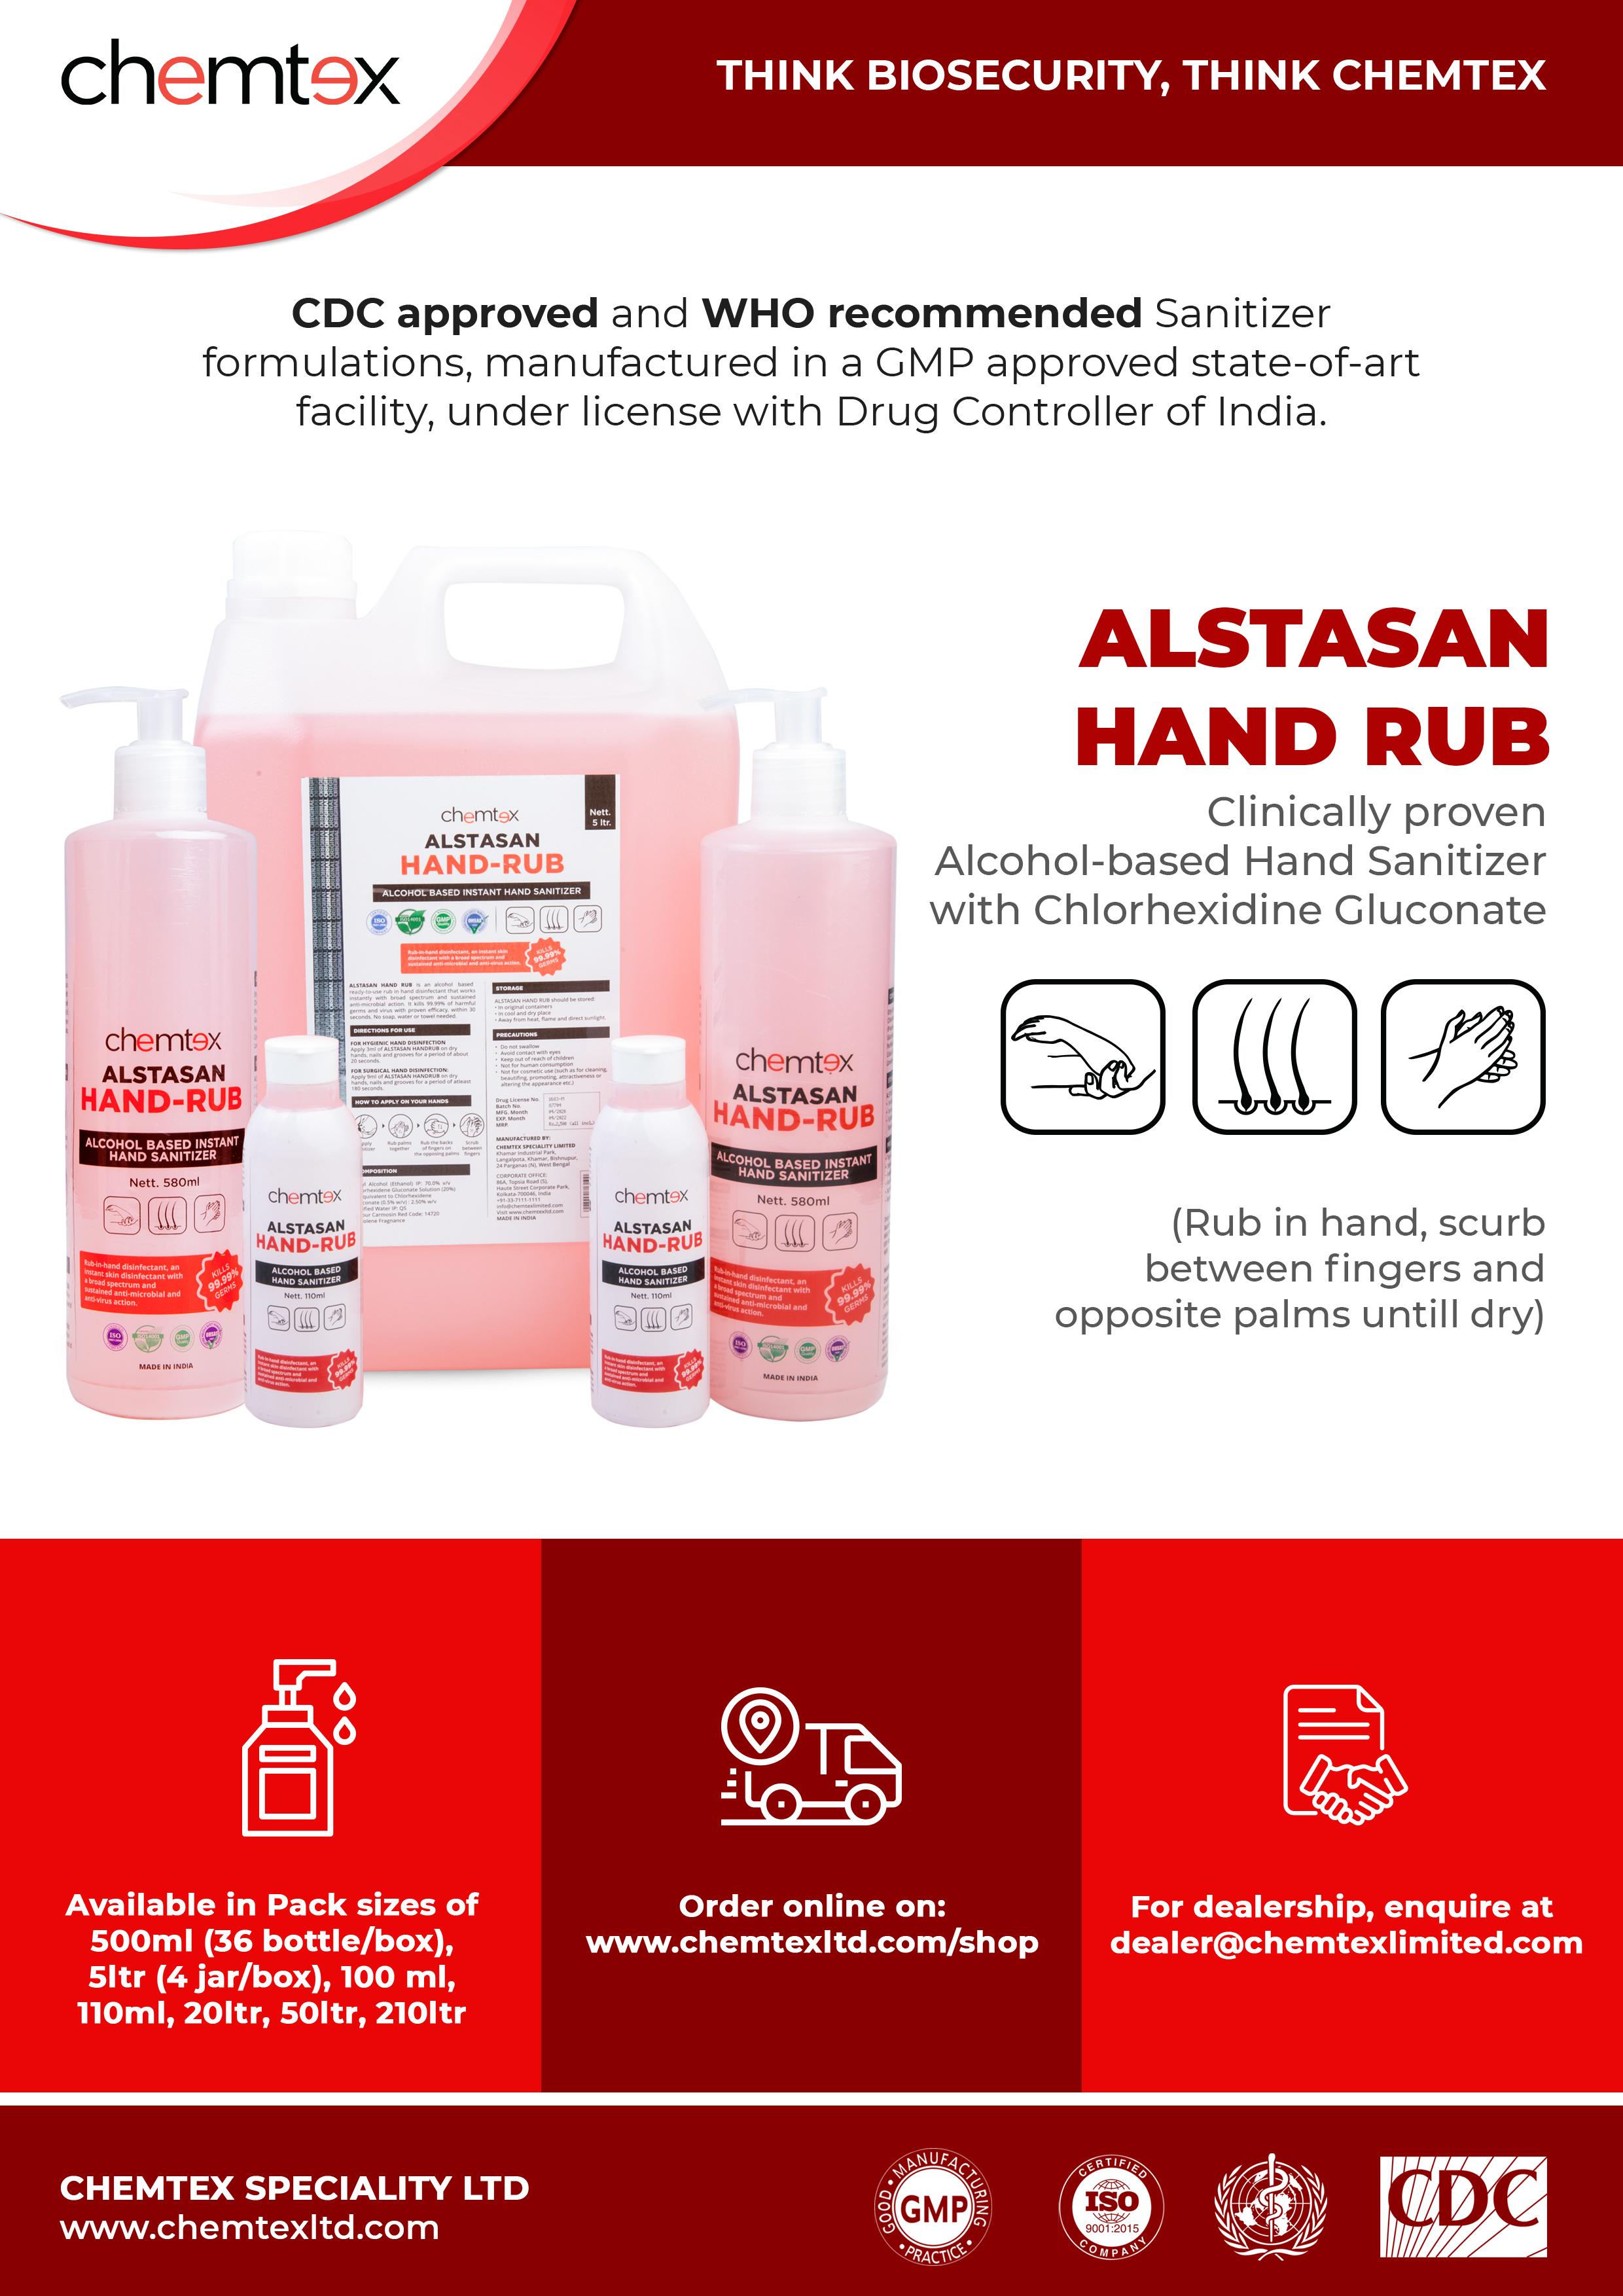 ALSTASAN HAND RUB: Alcohol based Hand Sanitizer